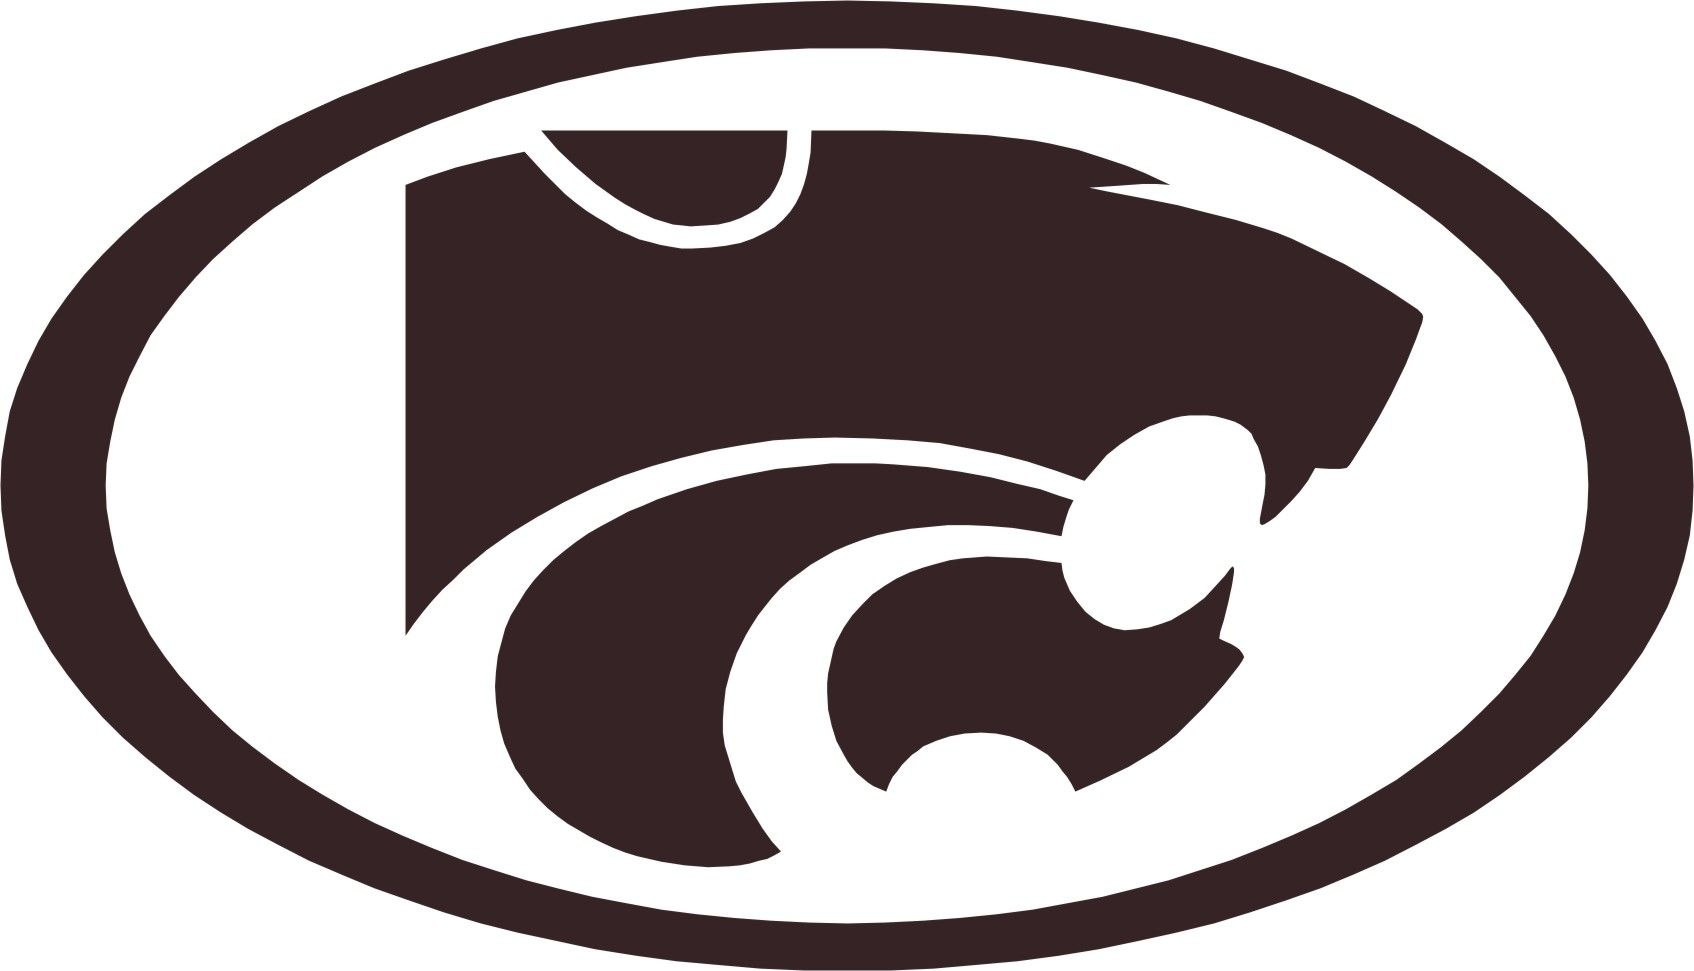 k state wildcats logo.